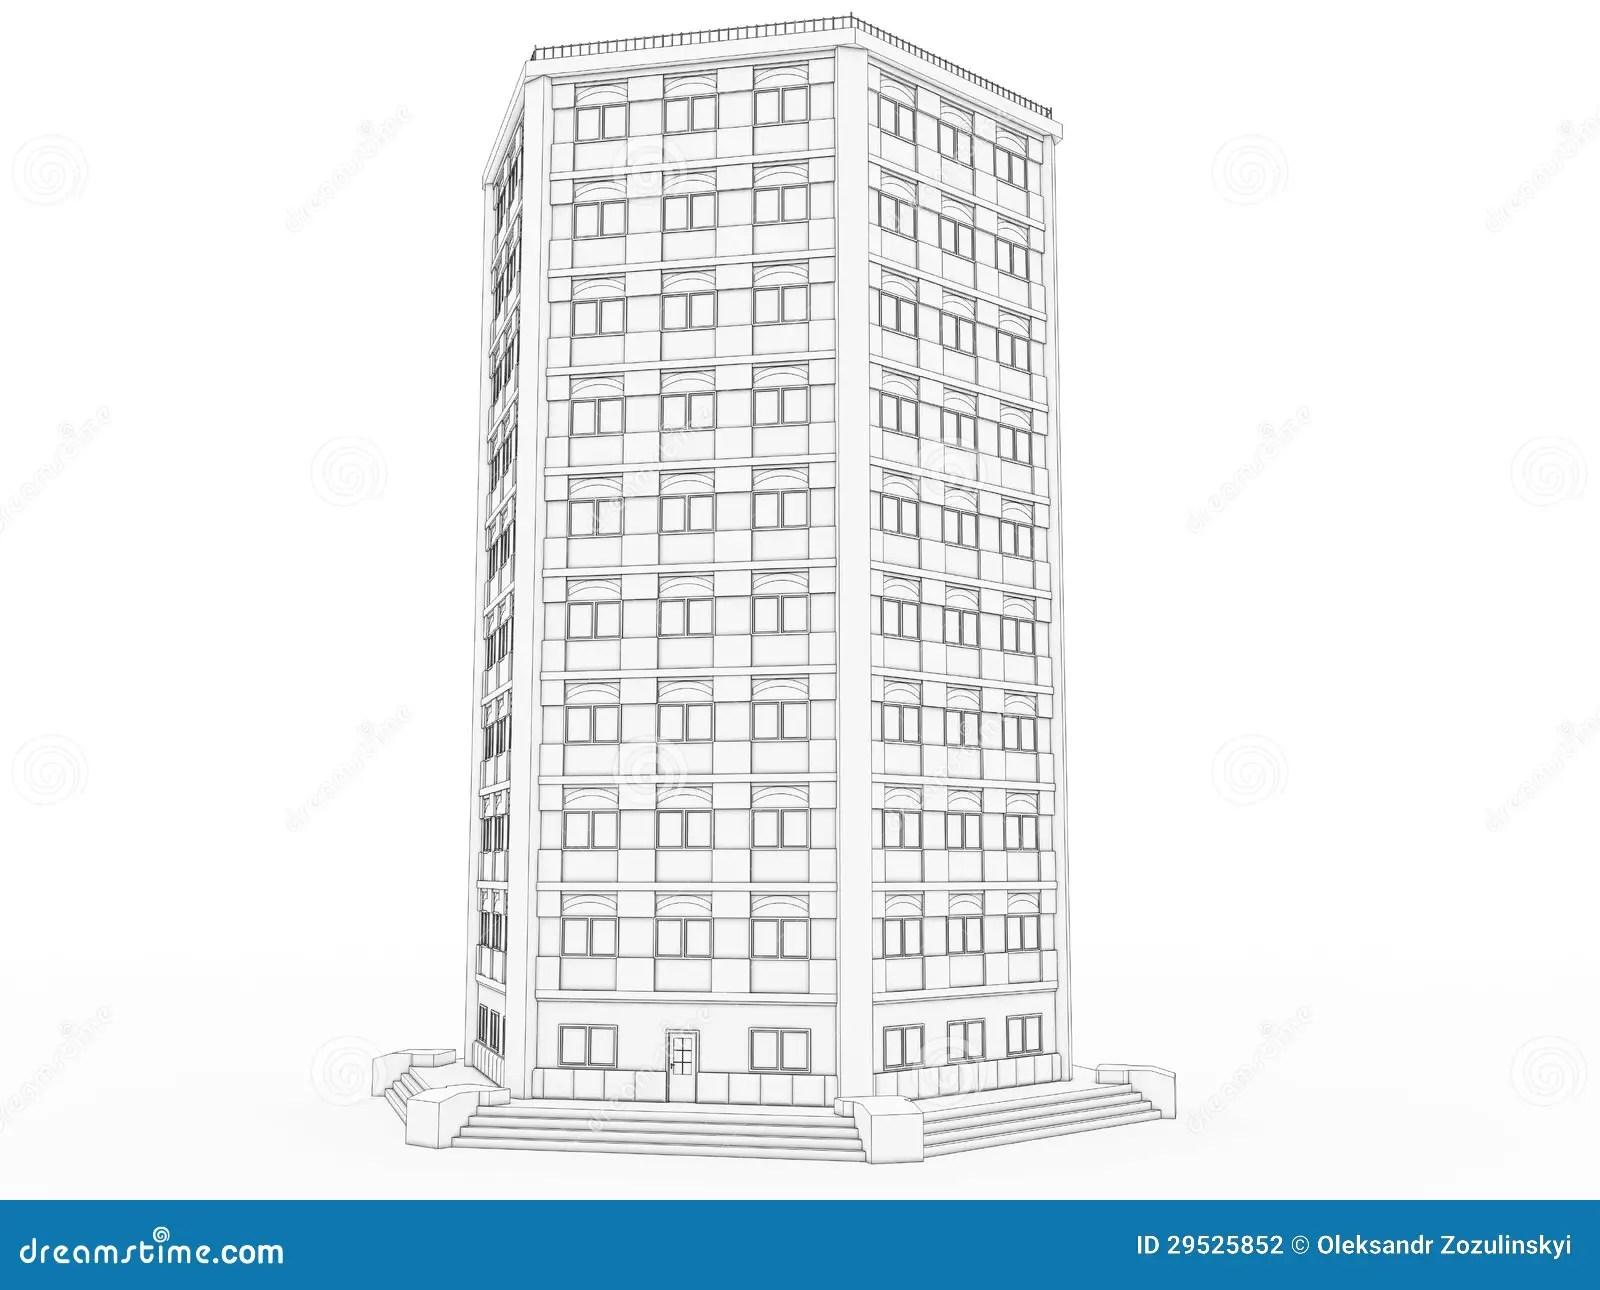 Volumetric The Building Drawing №1 Stock Illustration